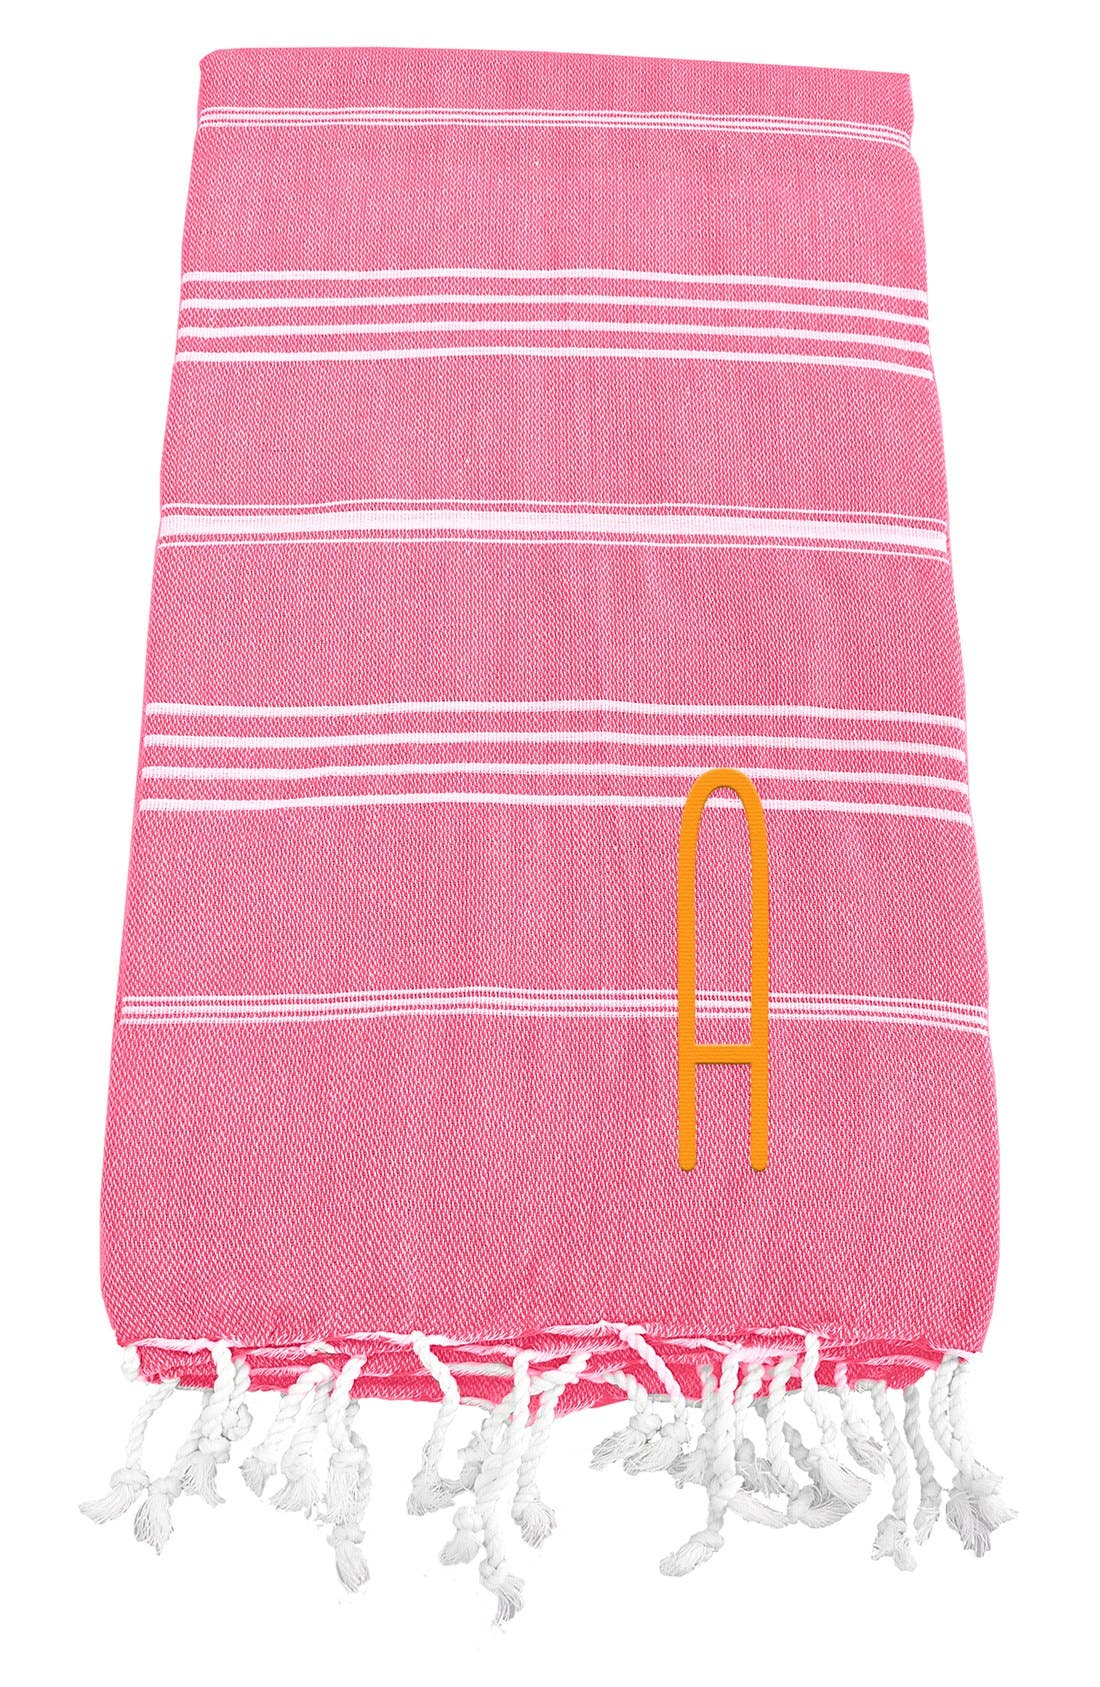 Monogram Turkish Cotton Towel,                             Main thumbnail 137, color,